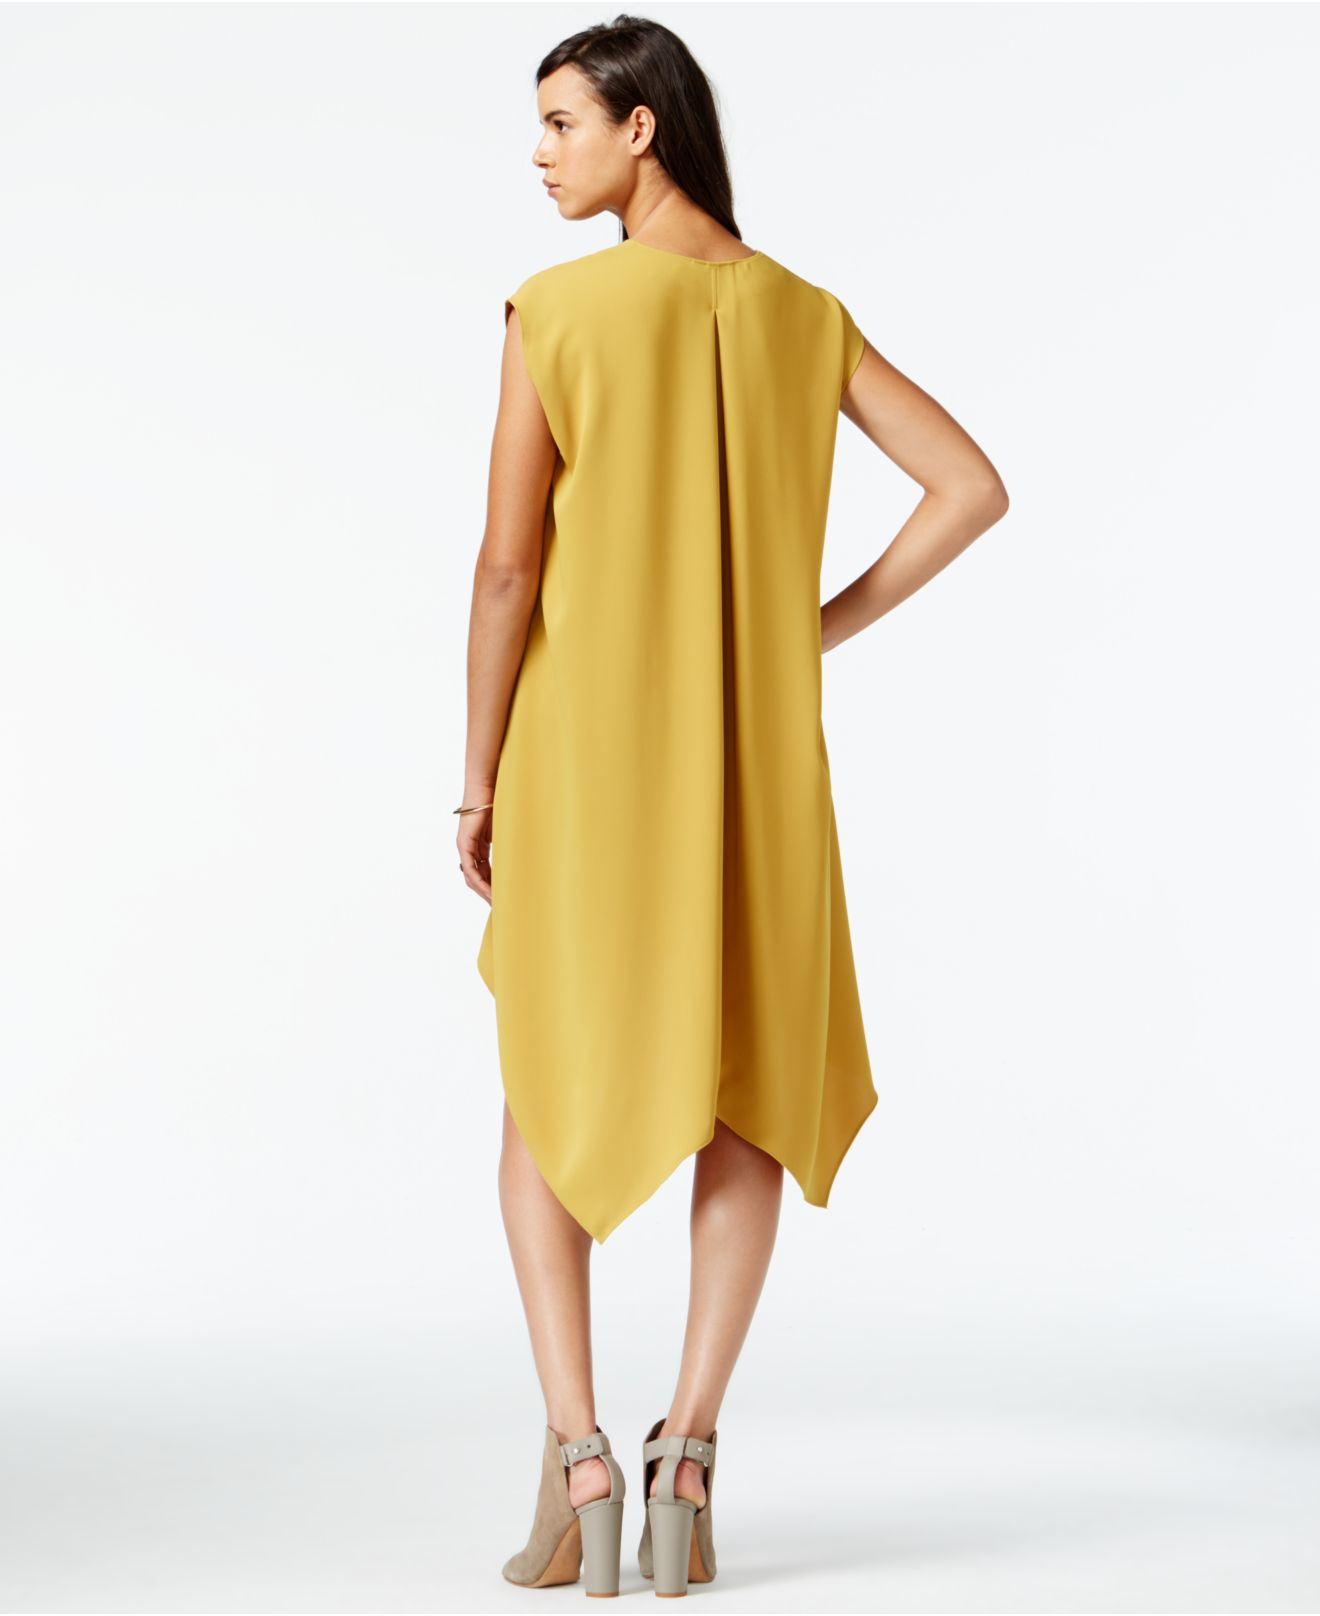 Lyst - RACHEL Rachel Roy Sydney High-low Dress in Yellow 229bb2bba